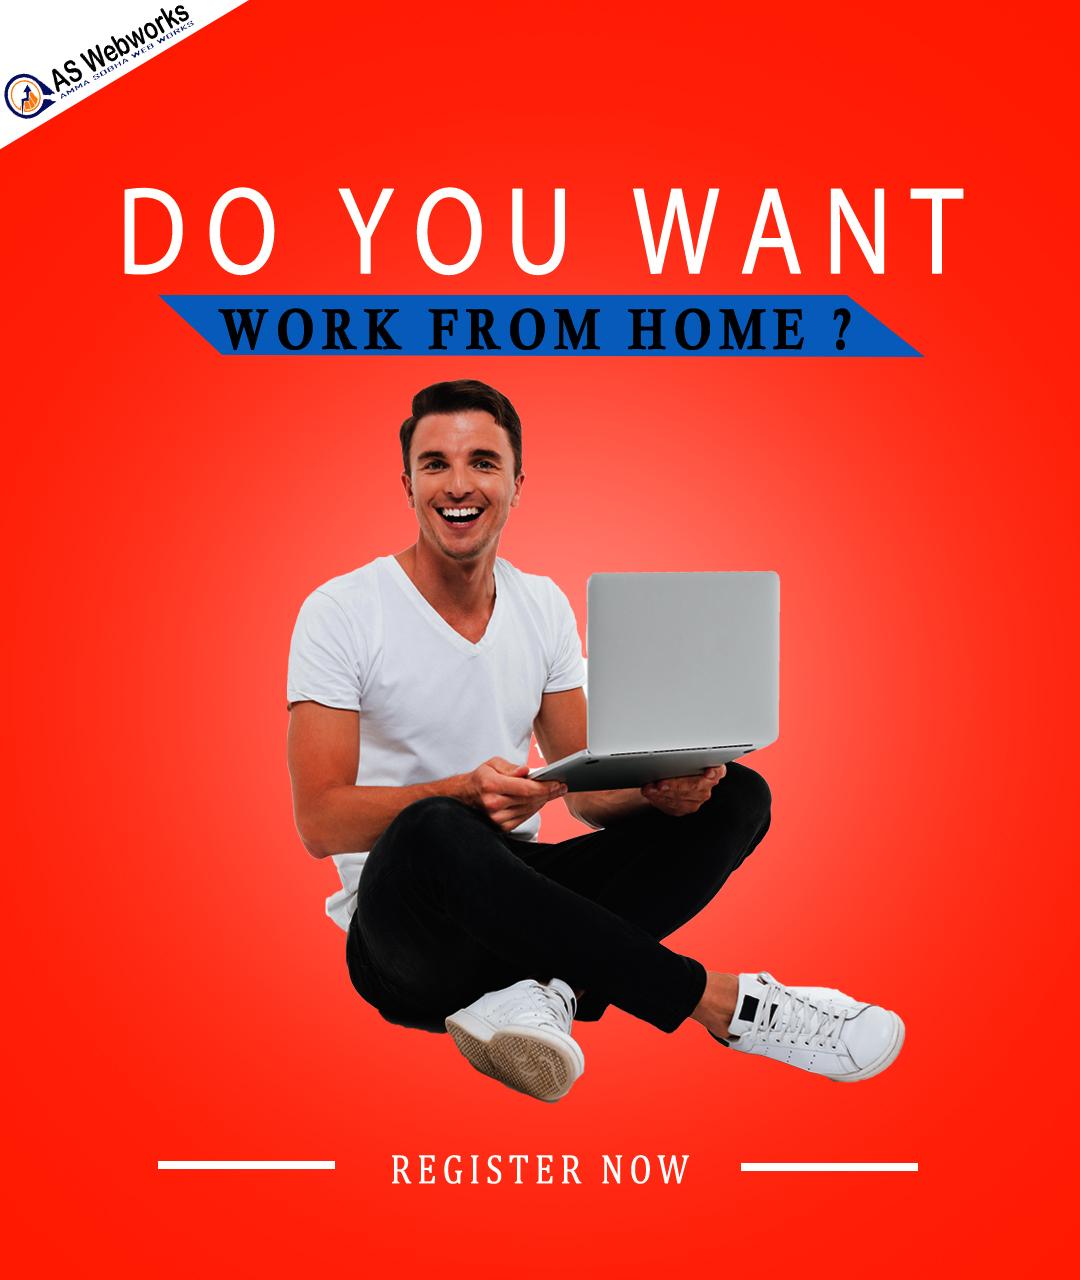 work from home - AS Webworks